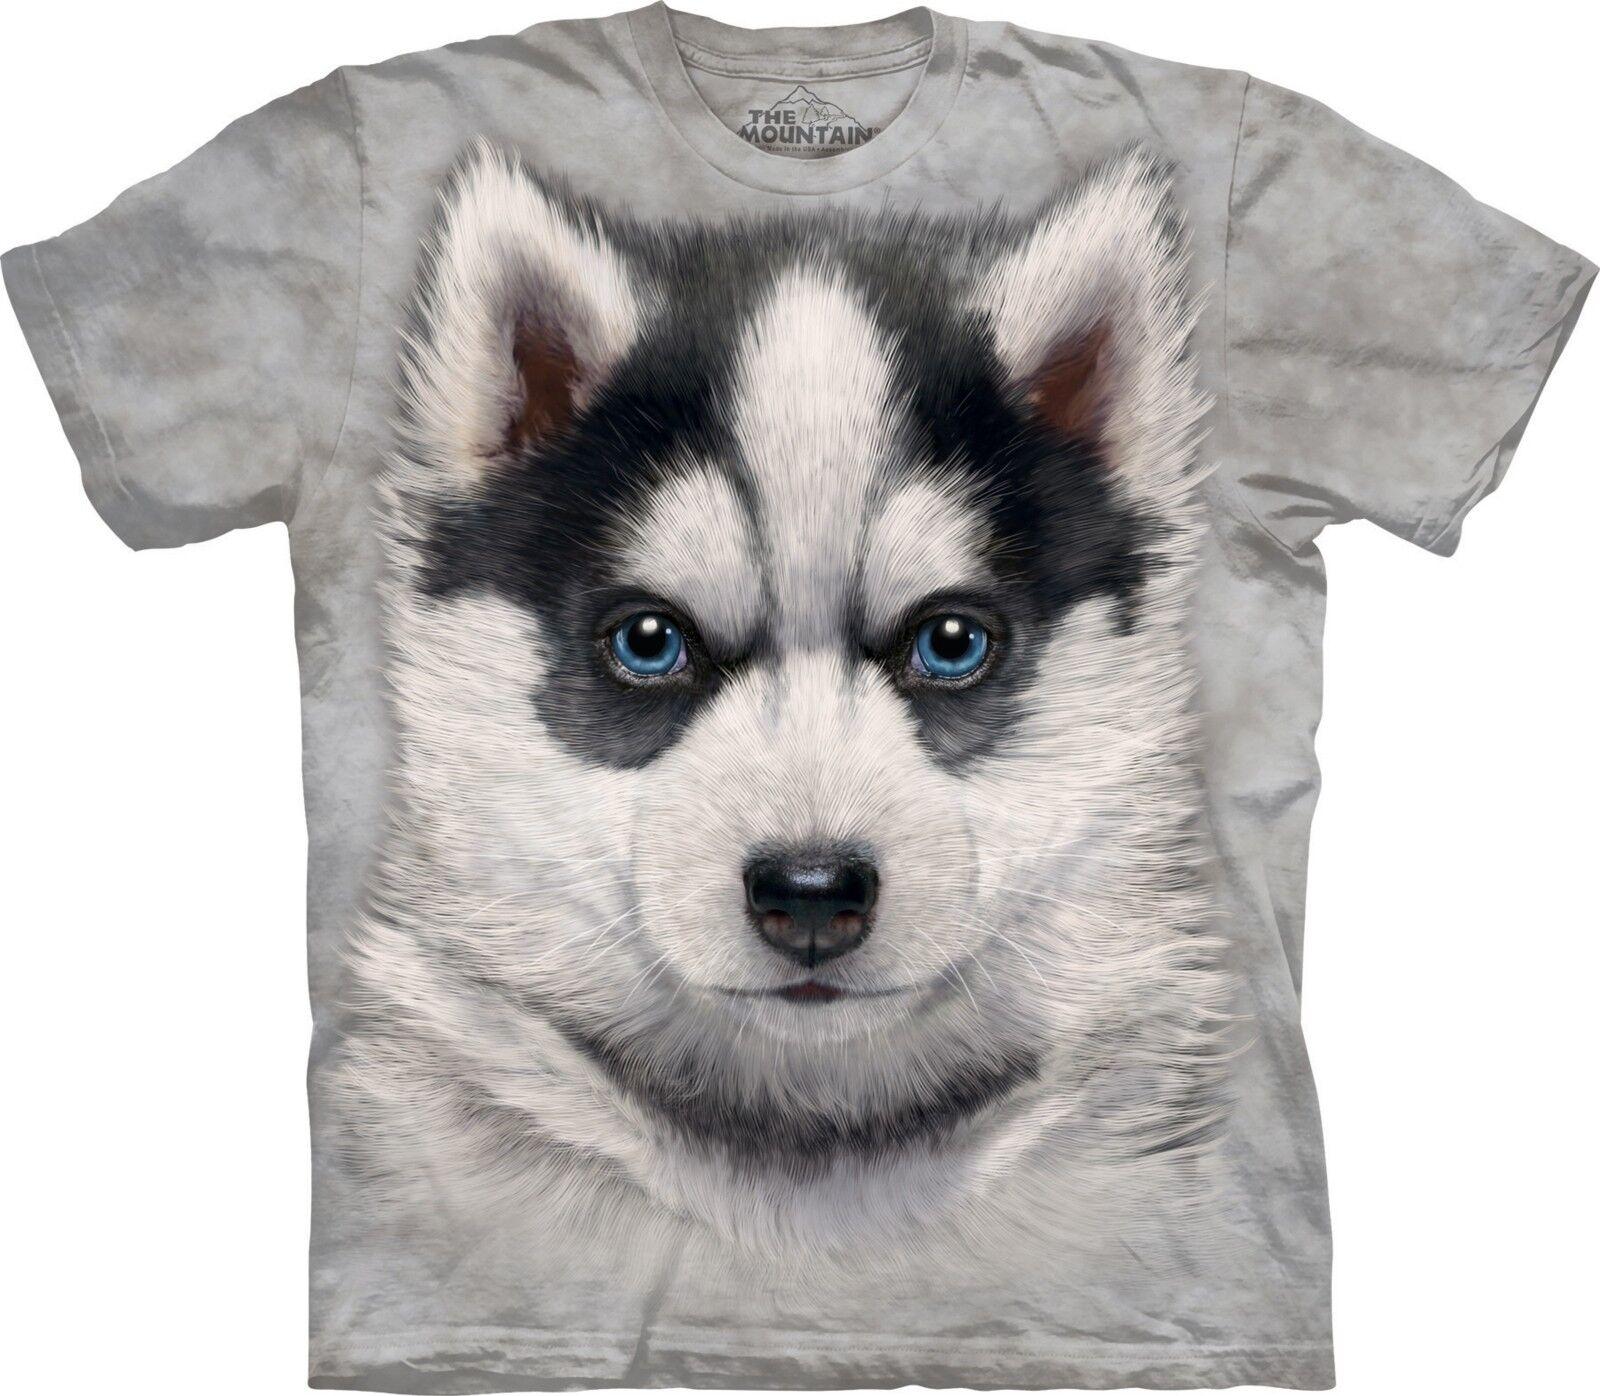 Siberian Husky Puppy Dog T Shirt Adult Unisex The Mountain